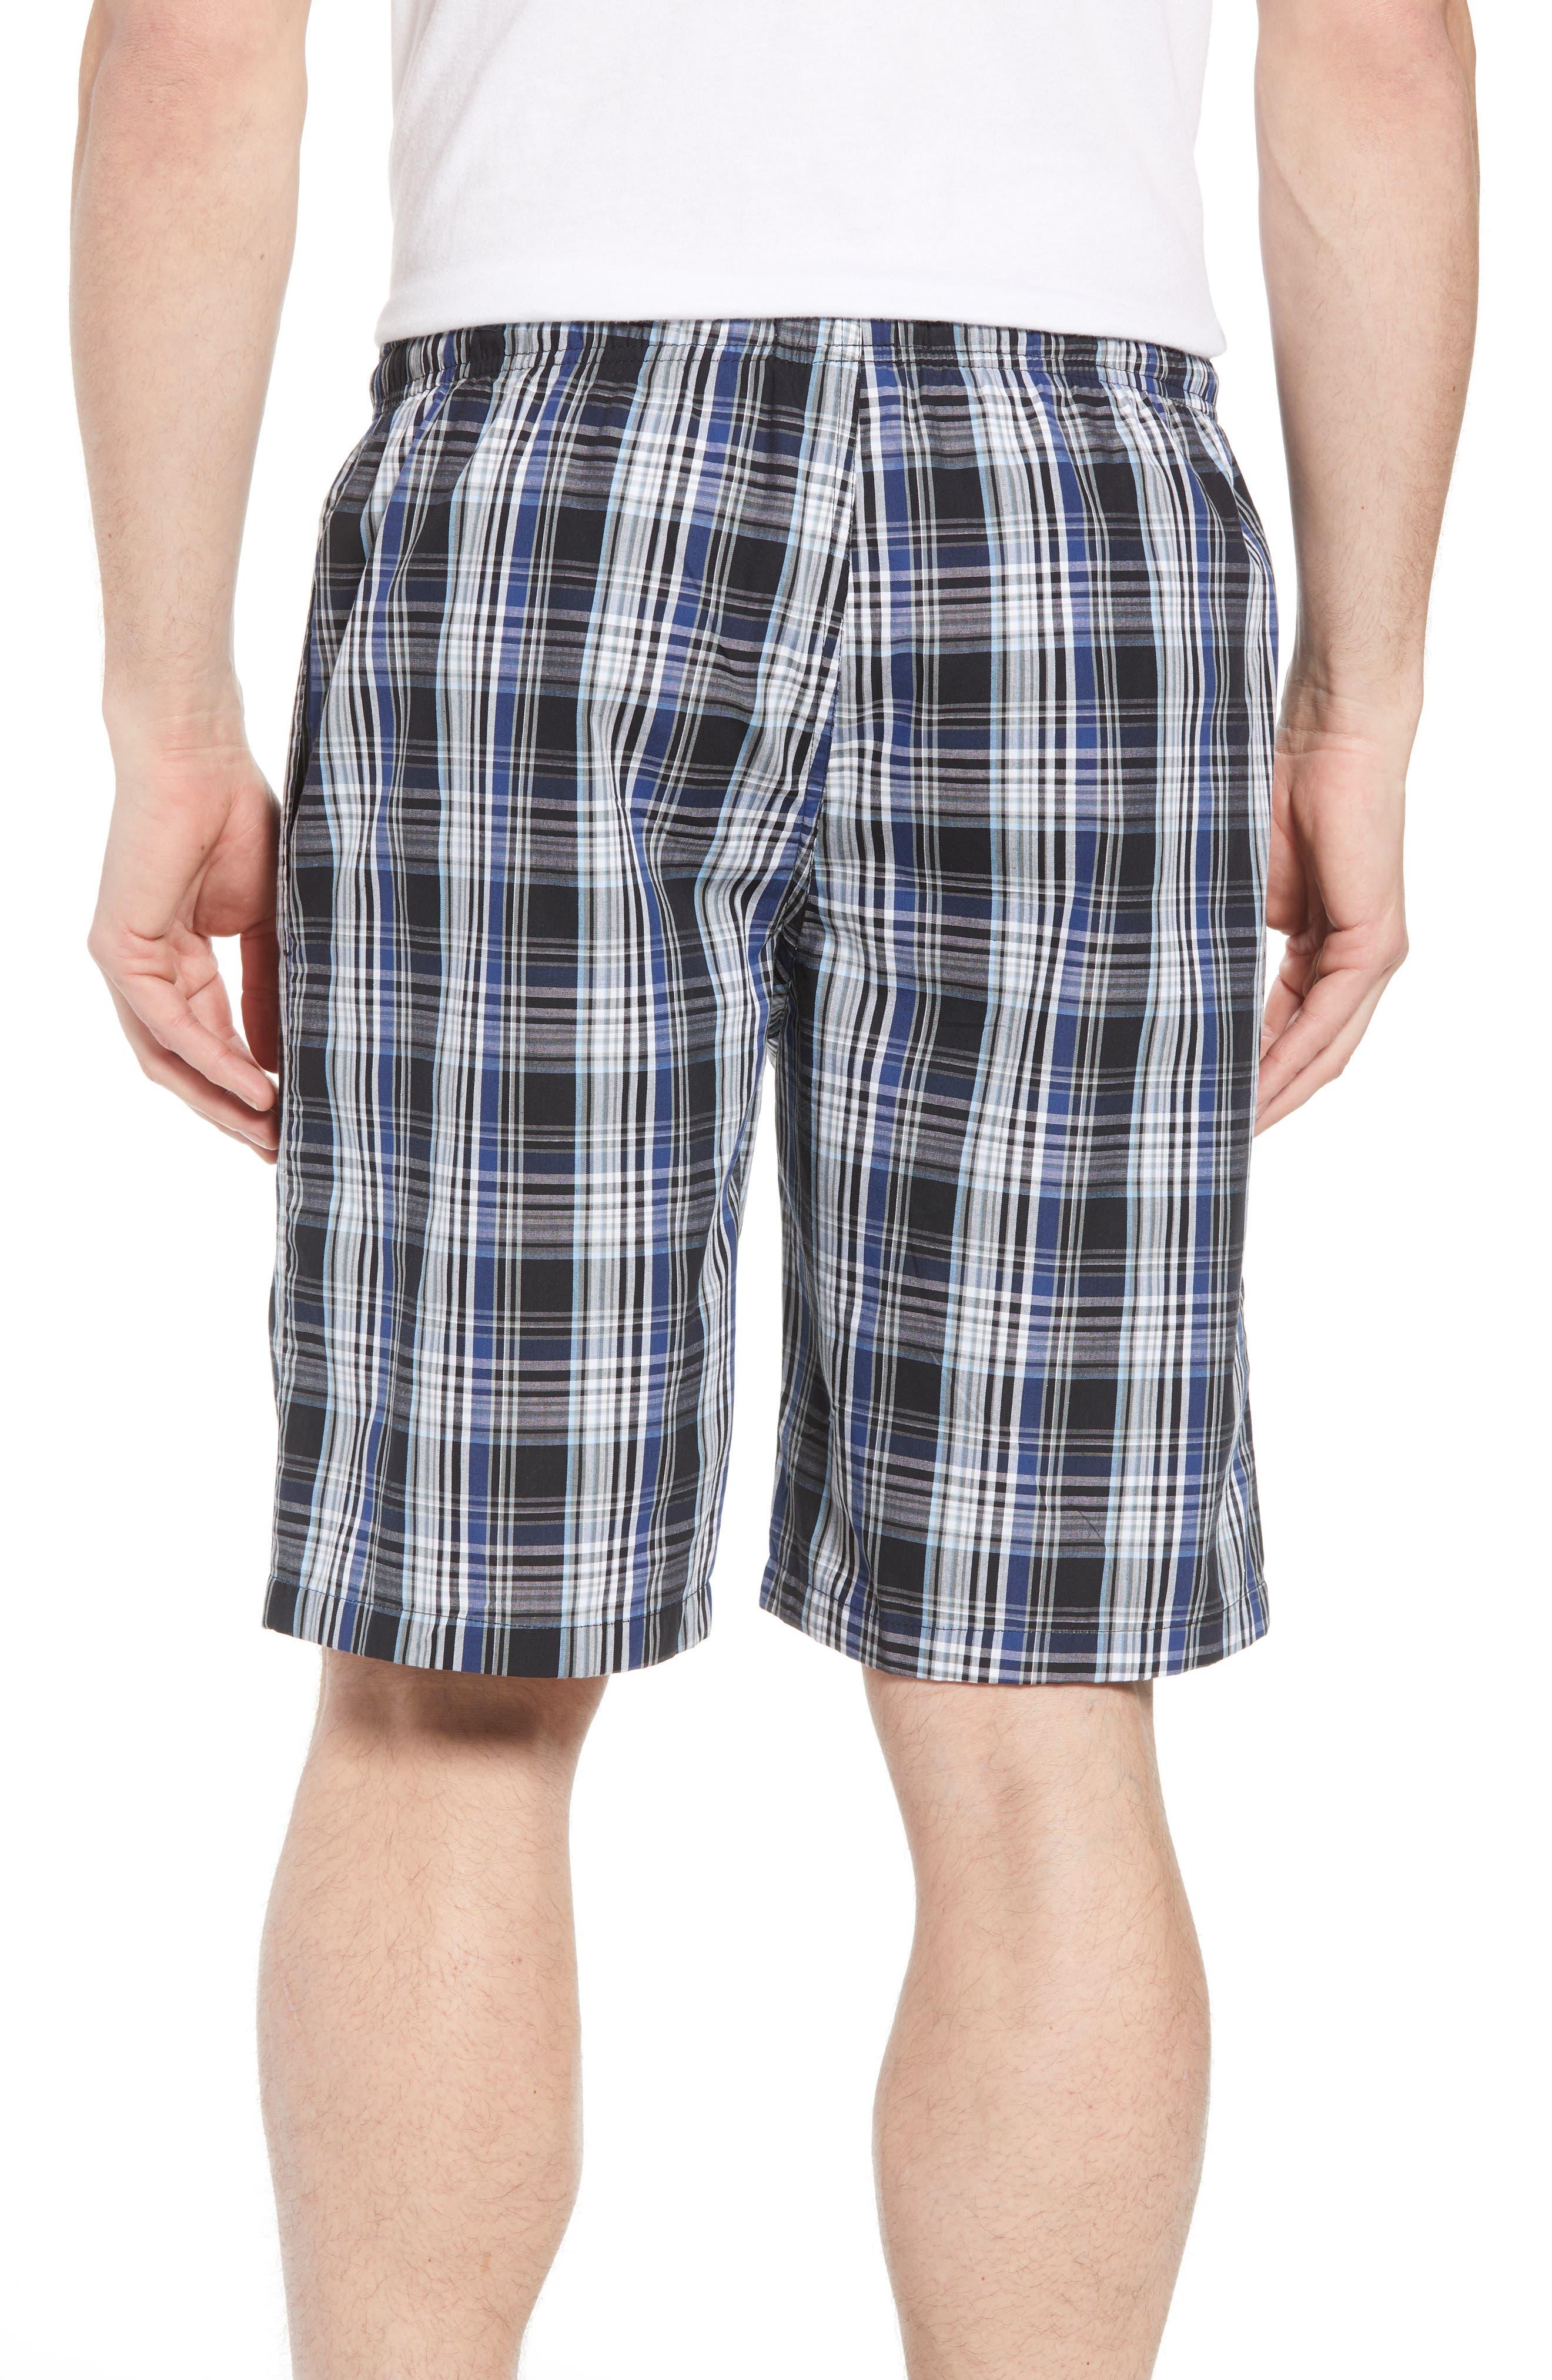 NORDSTROM MEN'S SHOP, Poplin Lounge Shorts, Alternate thumbnail 2, color, BLACK TWILIGHT BLUE PLAID